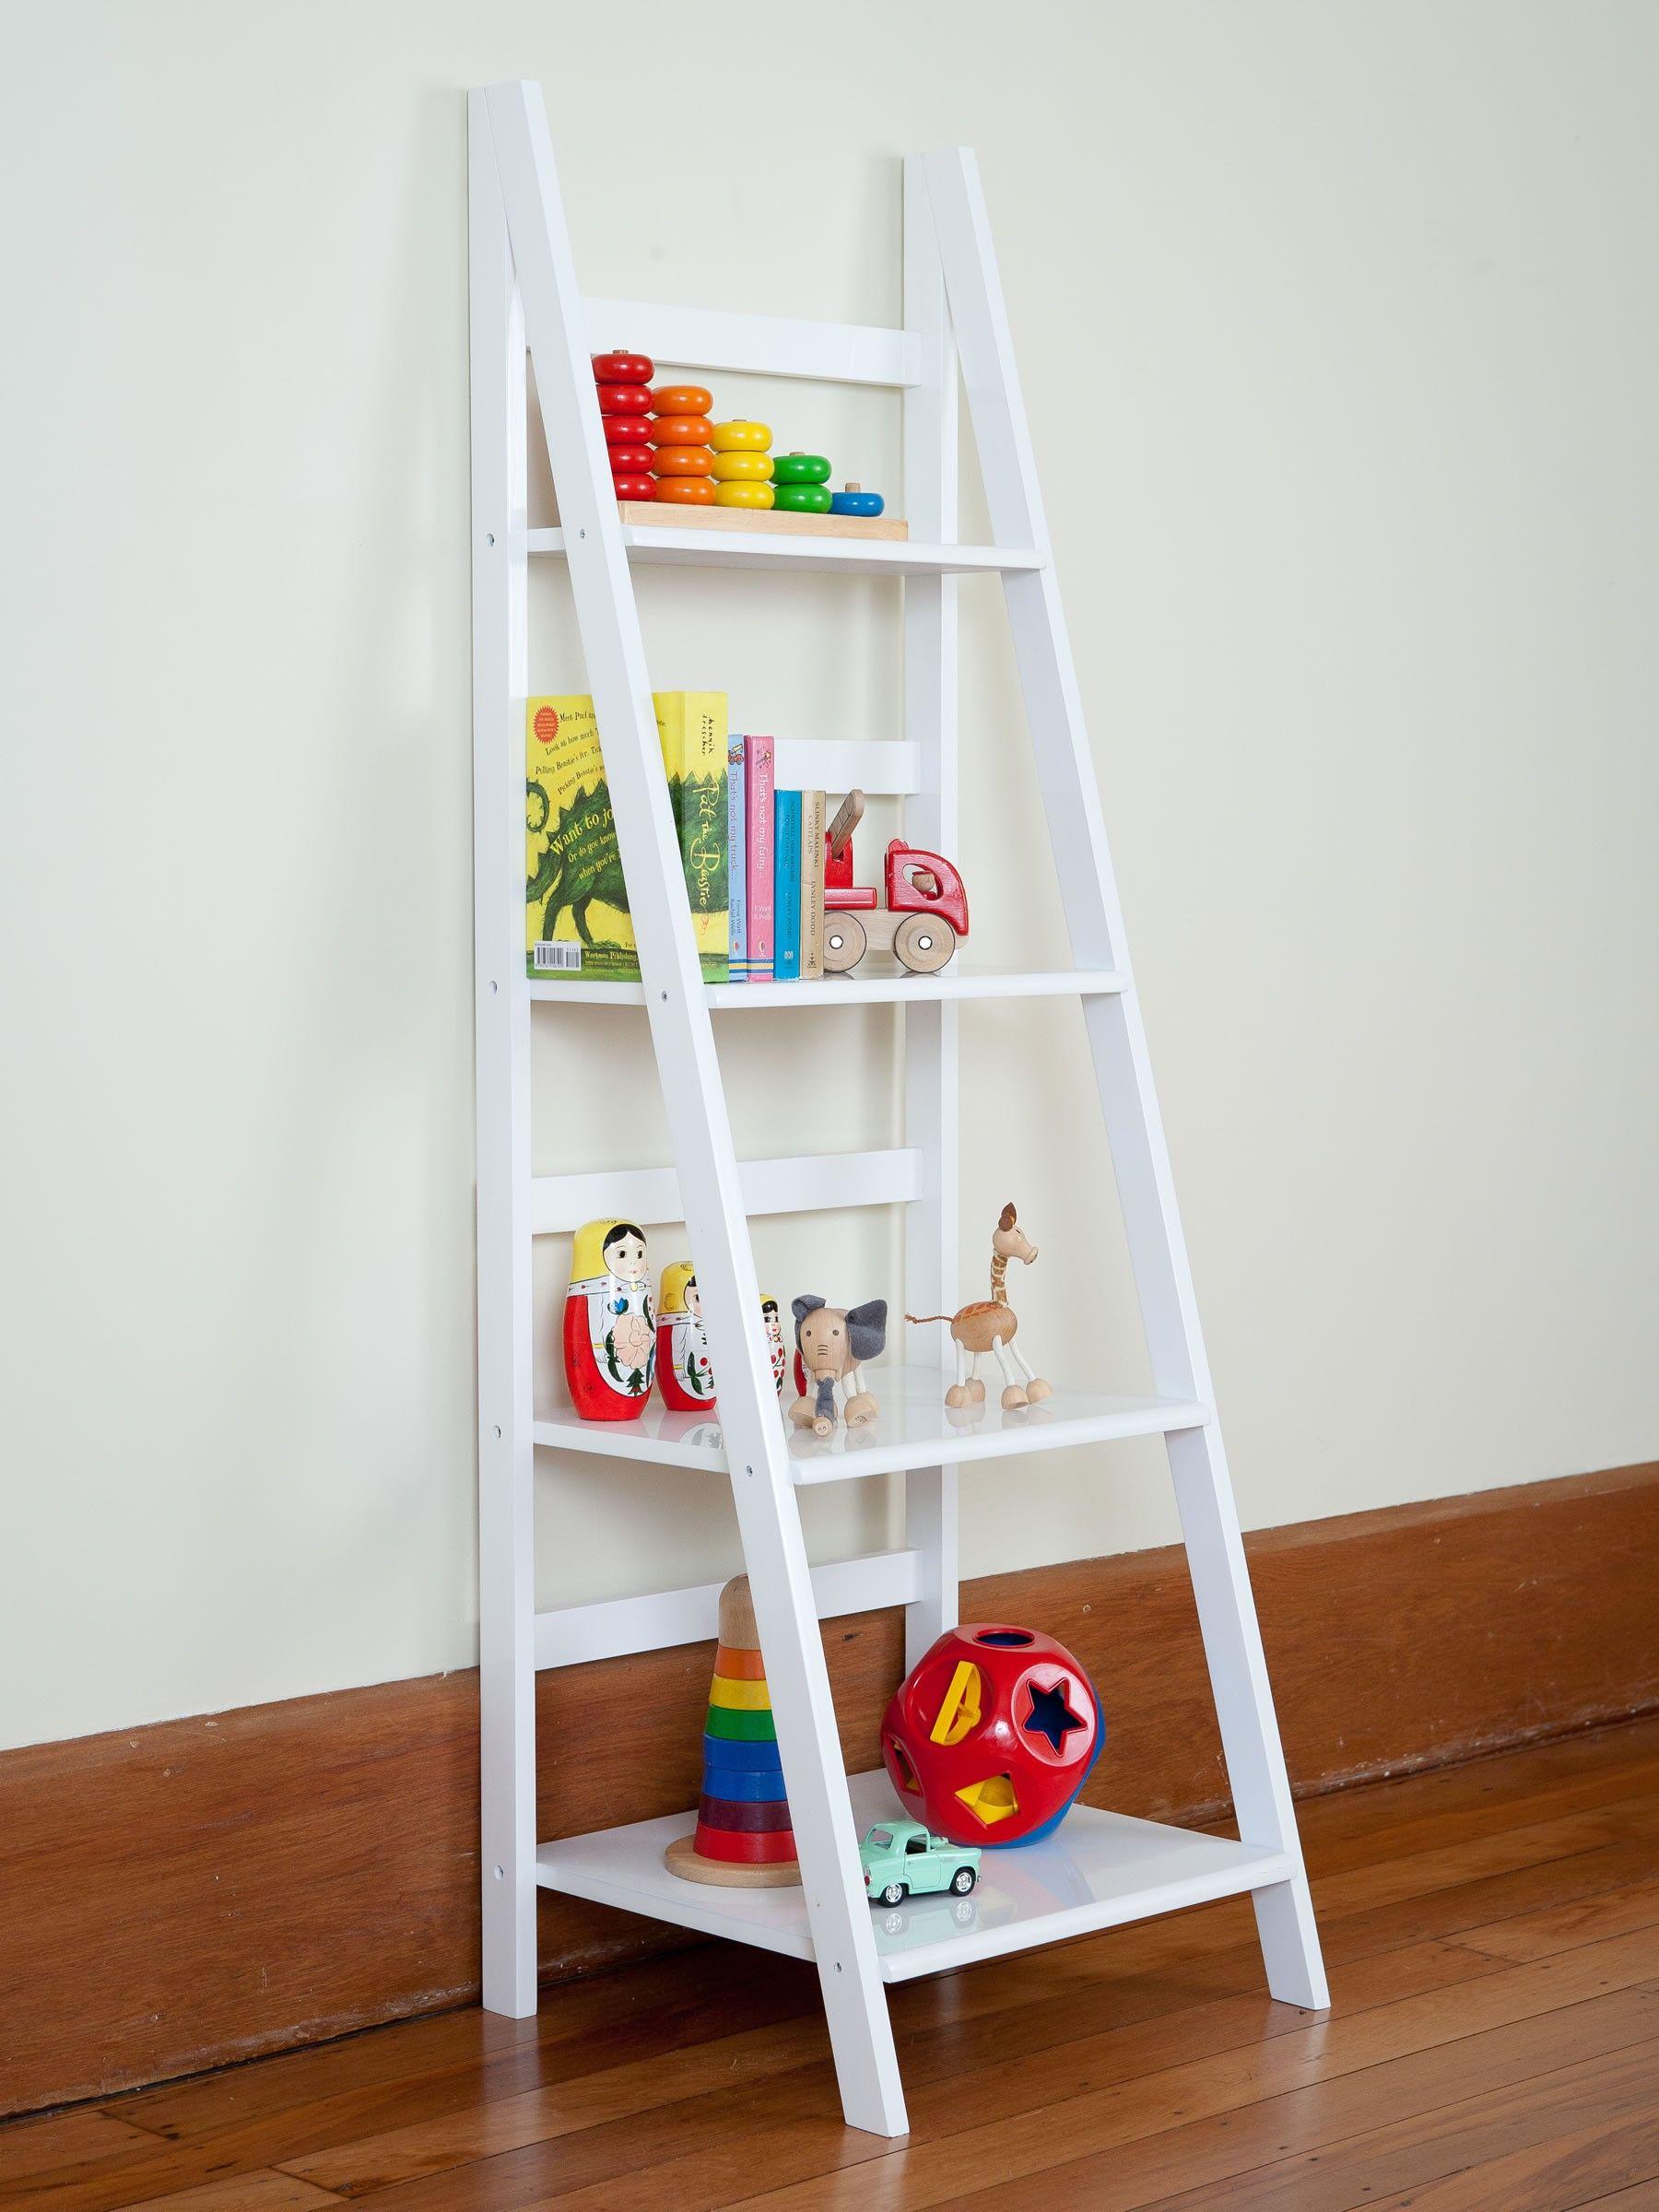 Enjoyable White Wooden Ladder Shelf As Toys Storage Added White